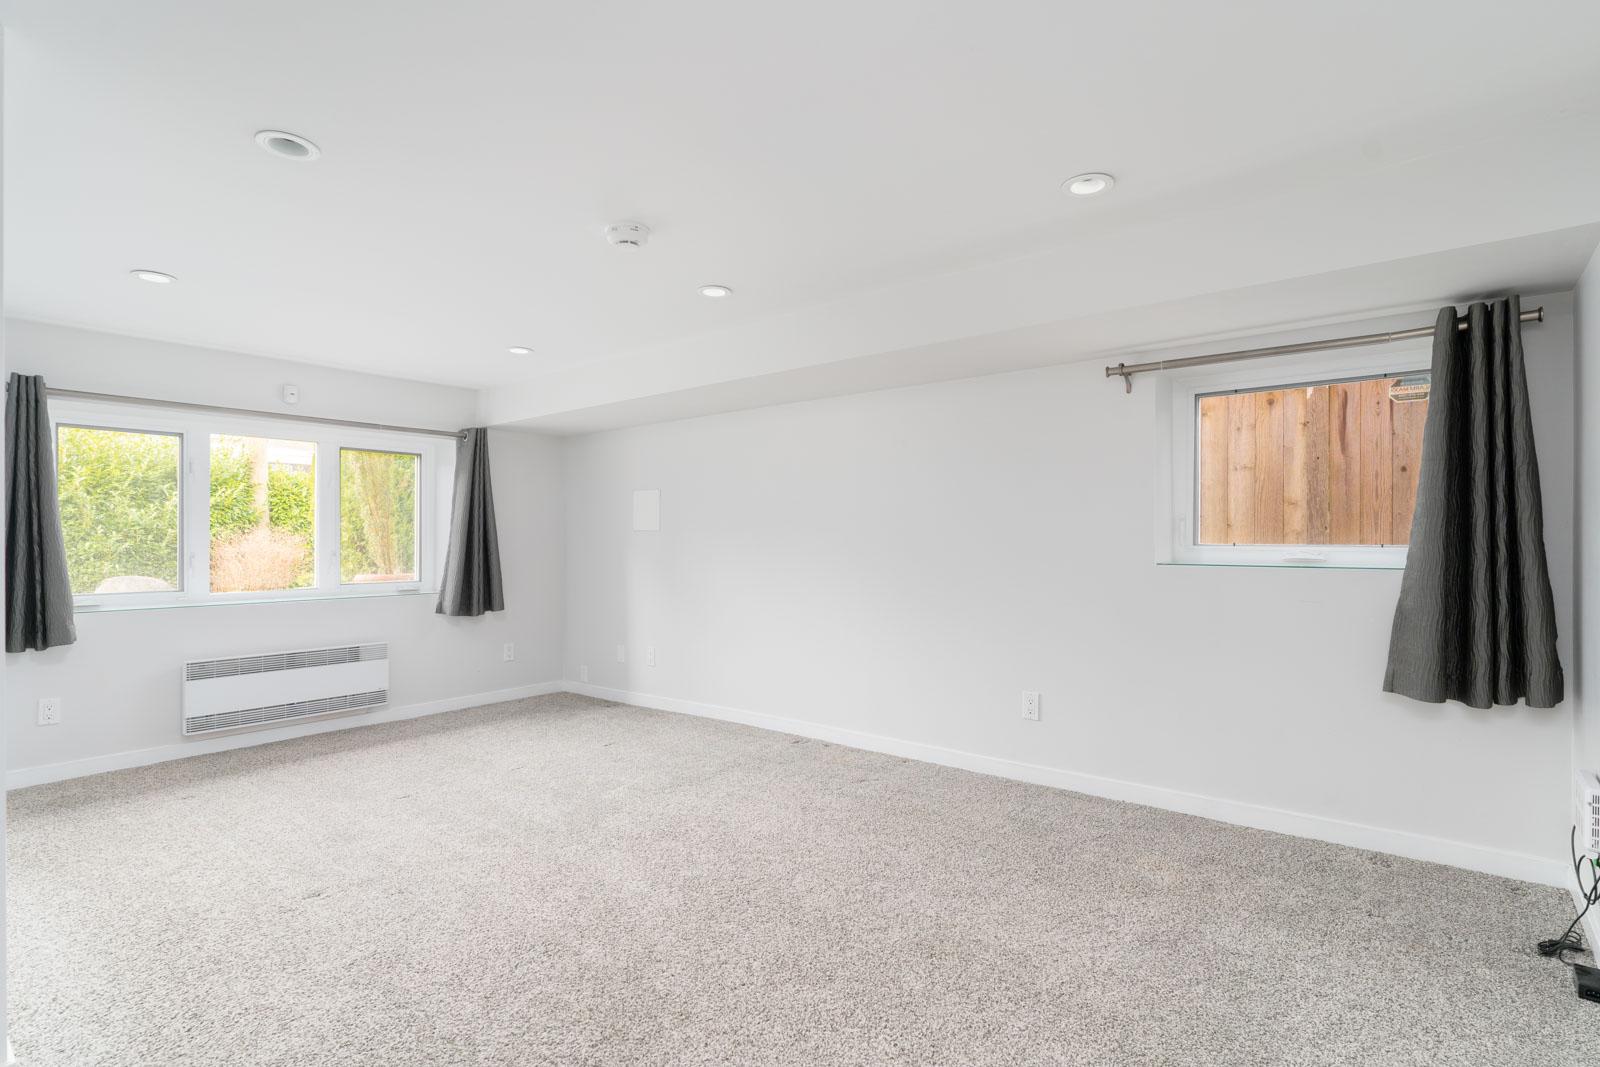 living room in rental basement in the Kitsalano neighbourhood of Vancouver